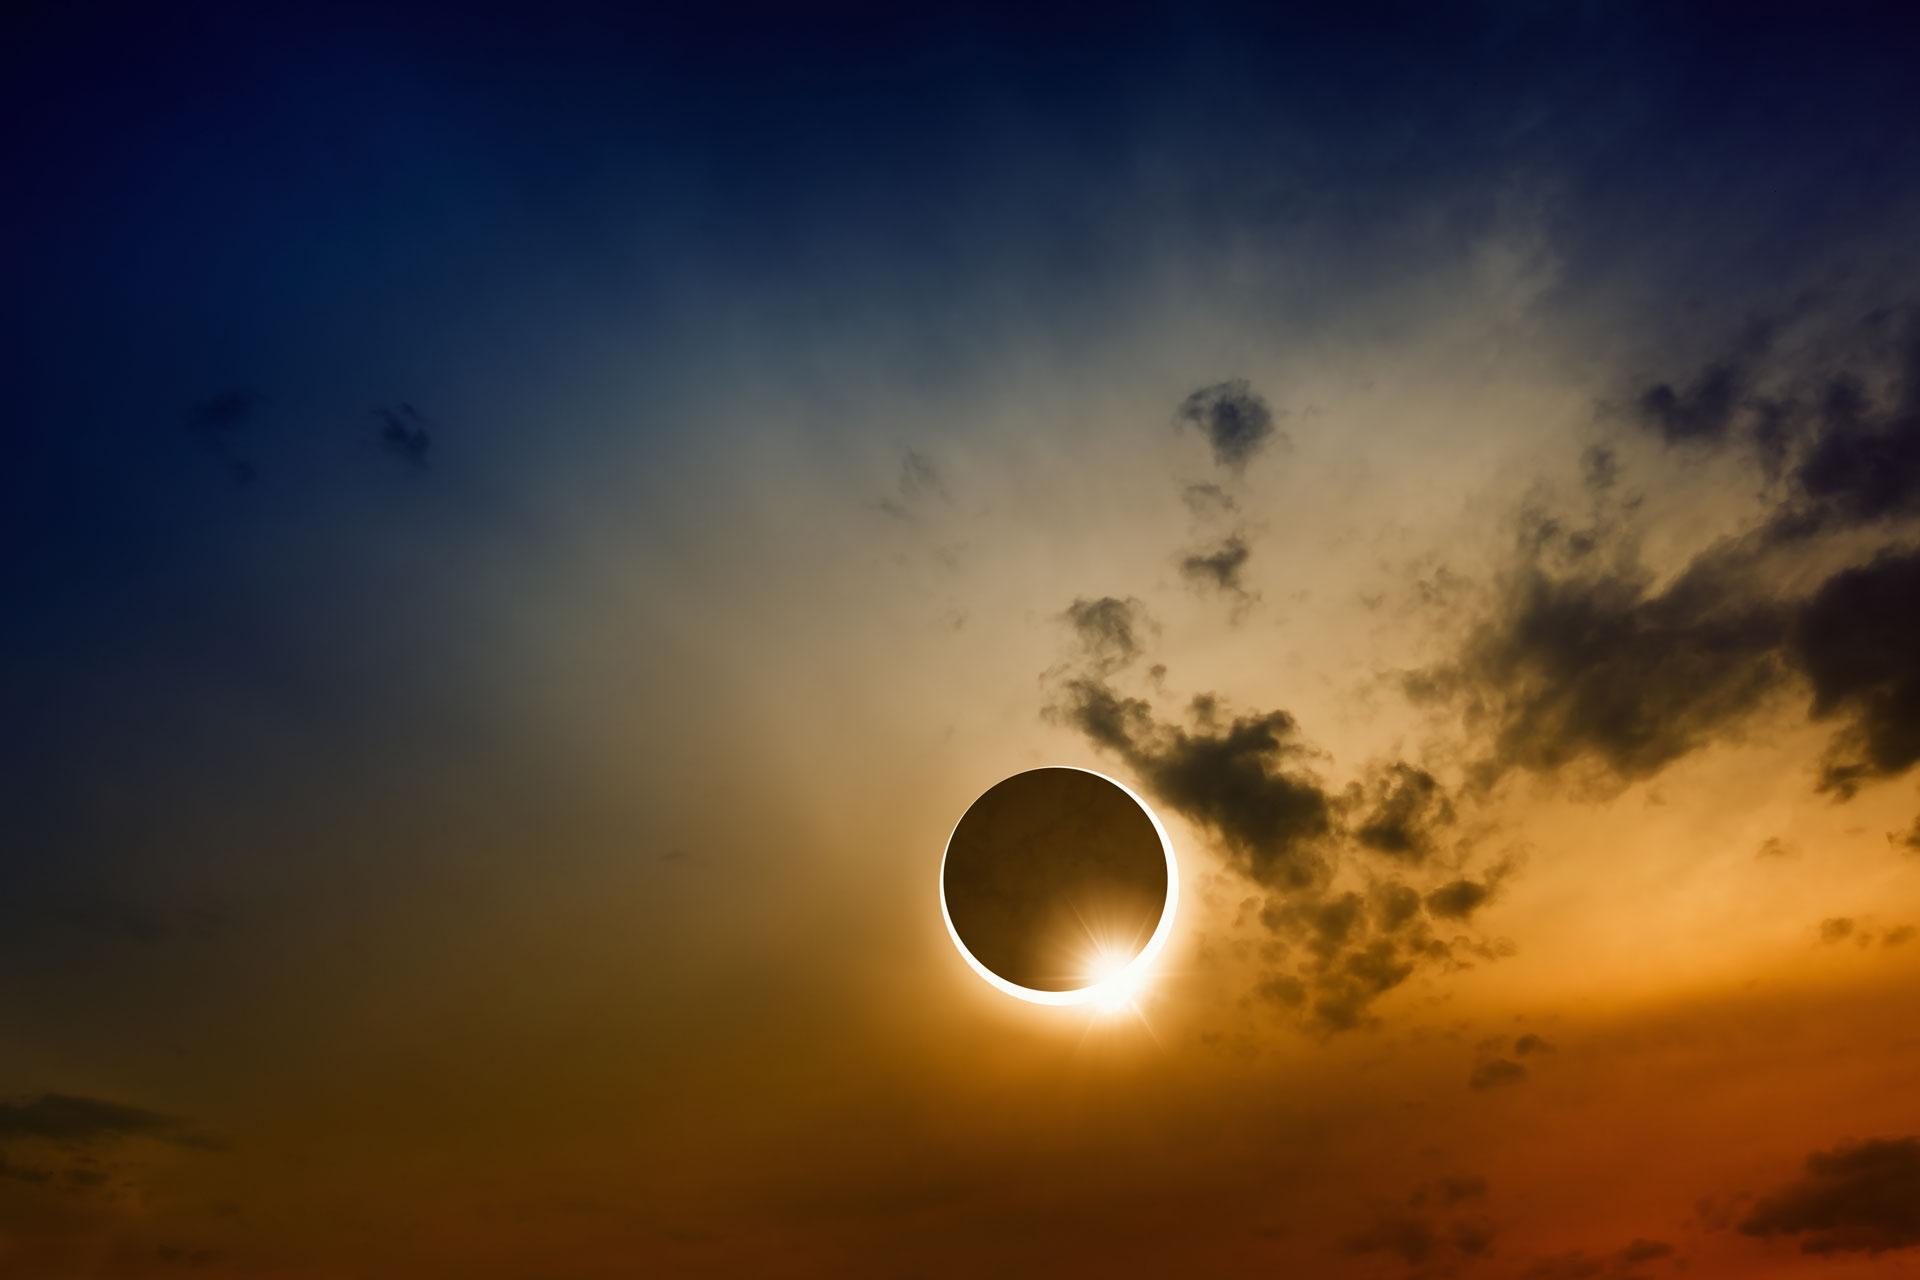 eclipse-2017-newsjacking.jpg